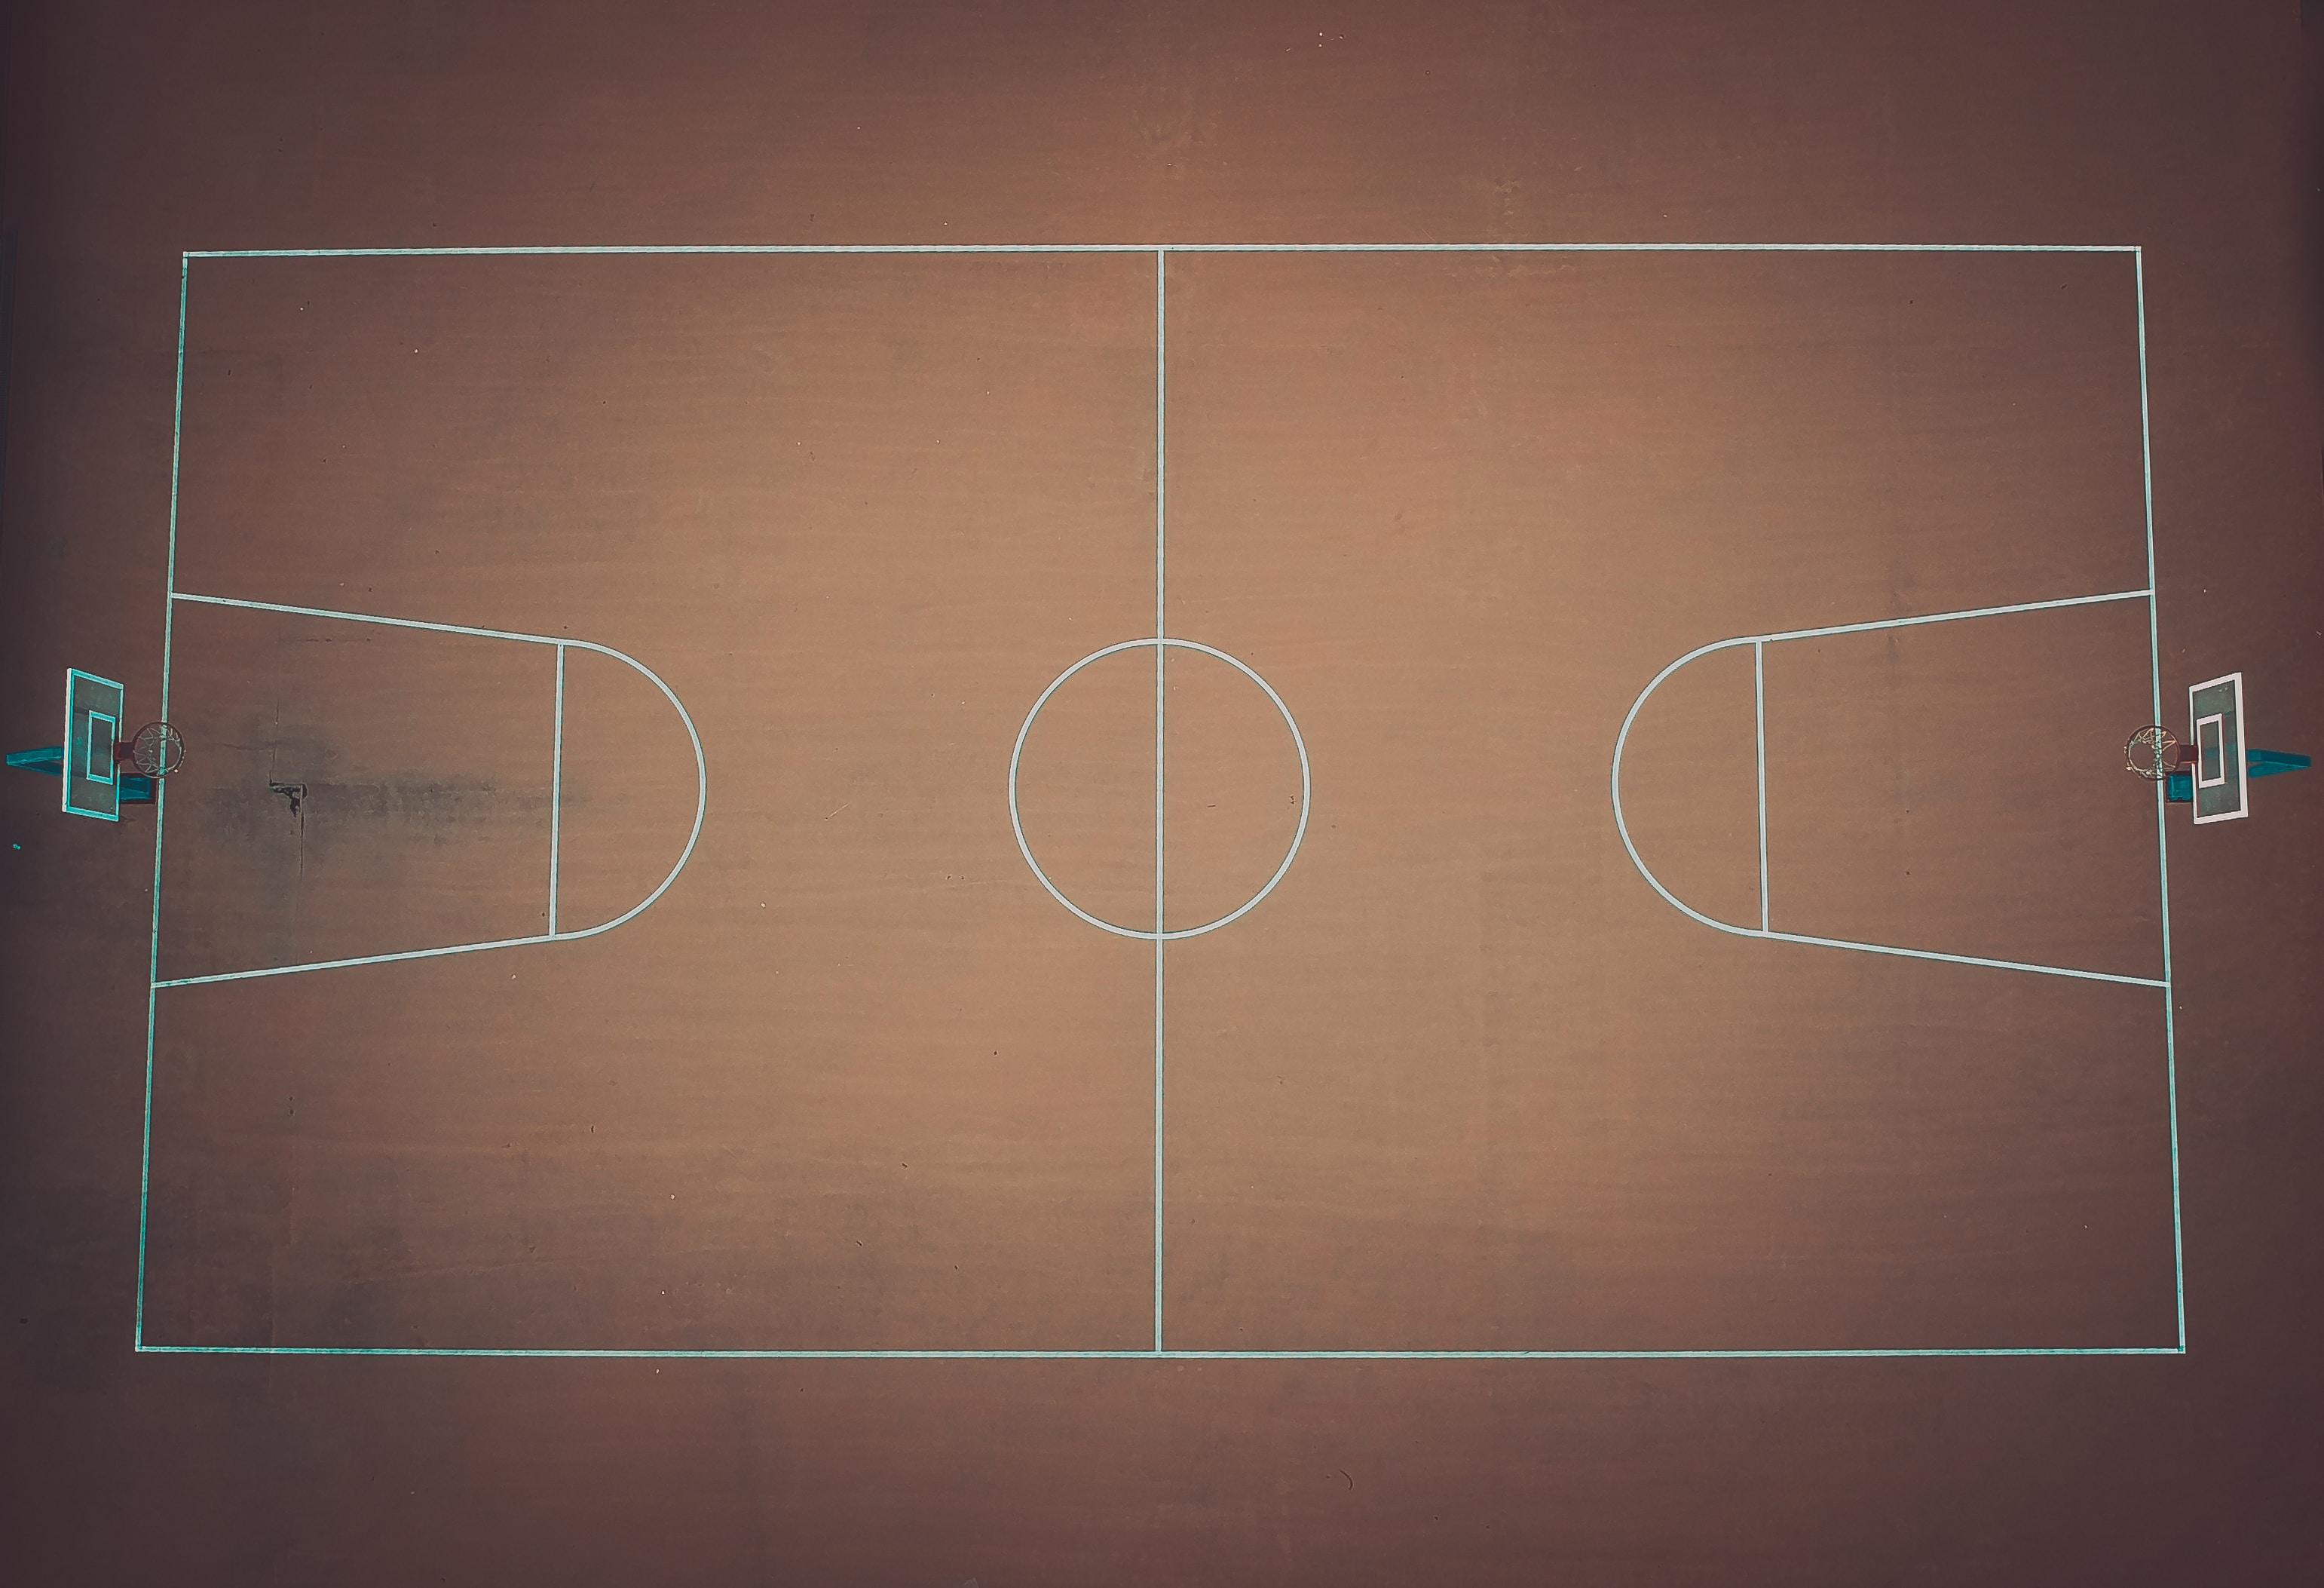 basketball court plan